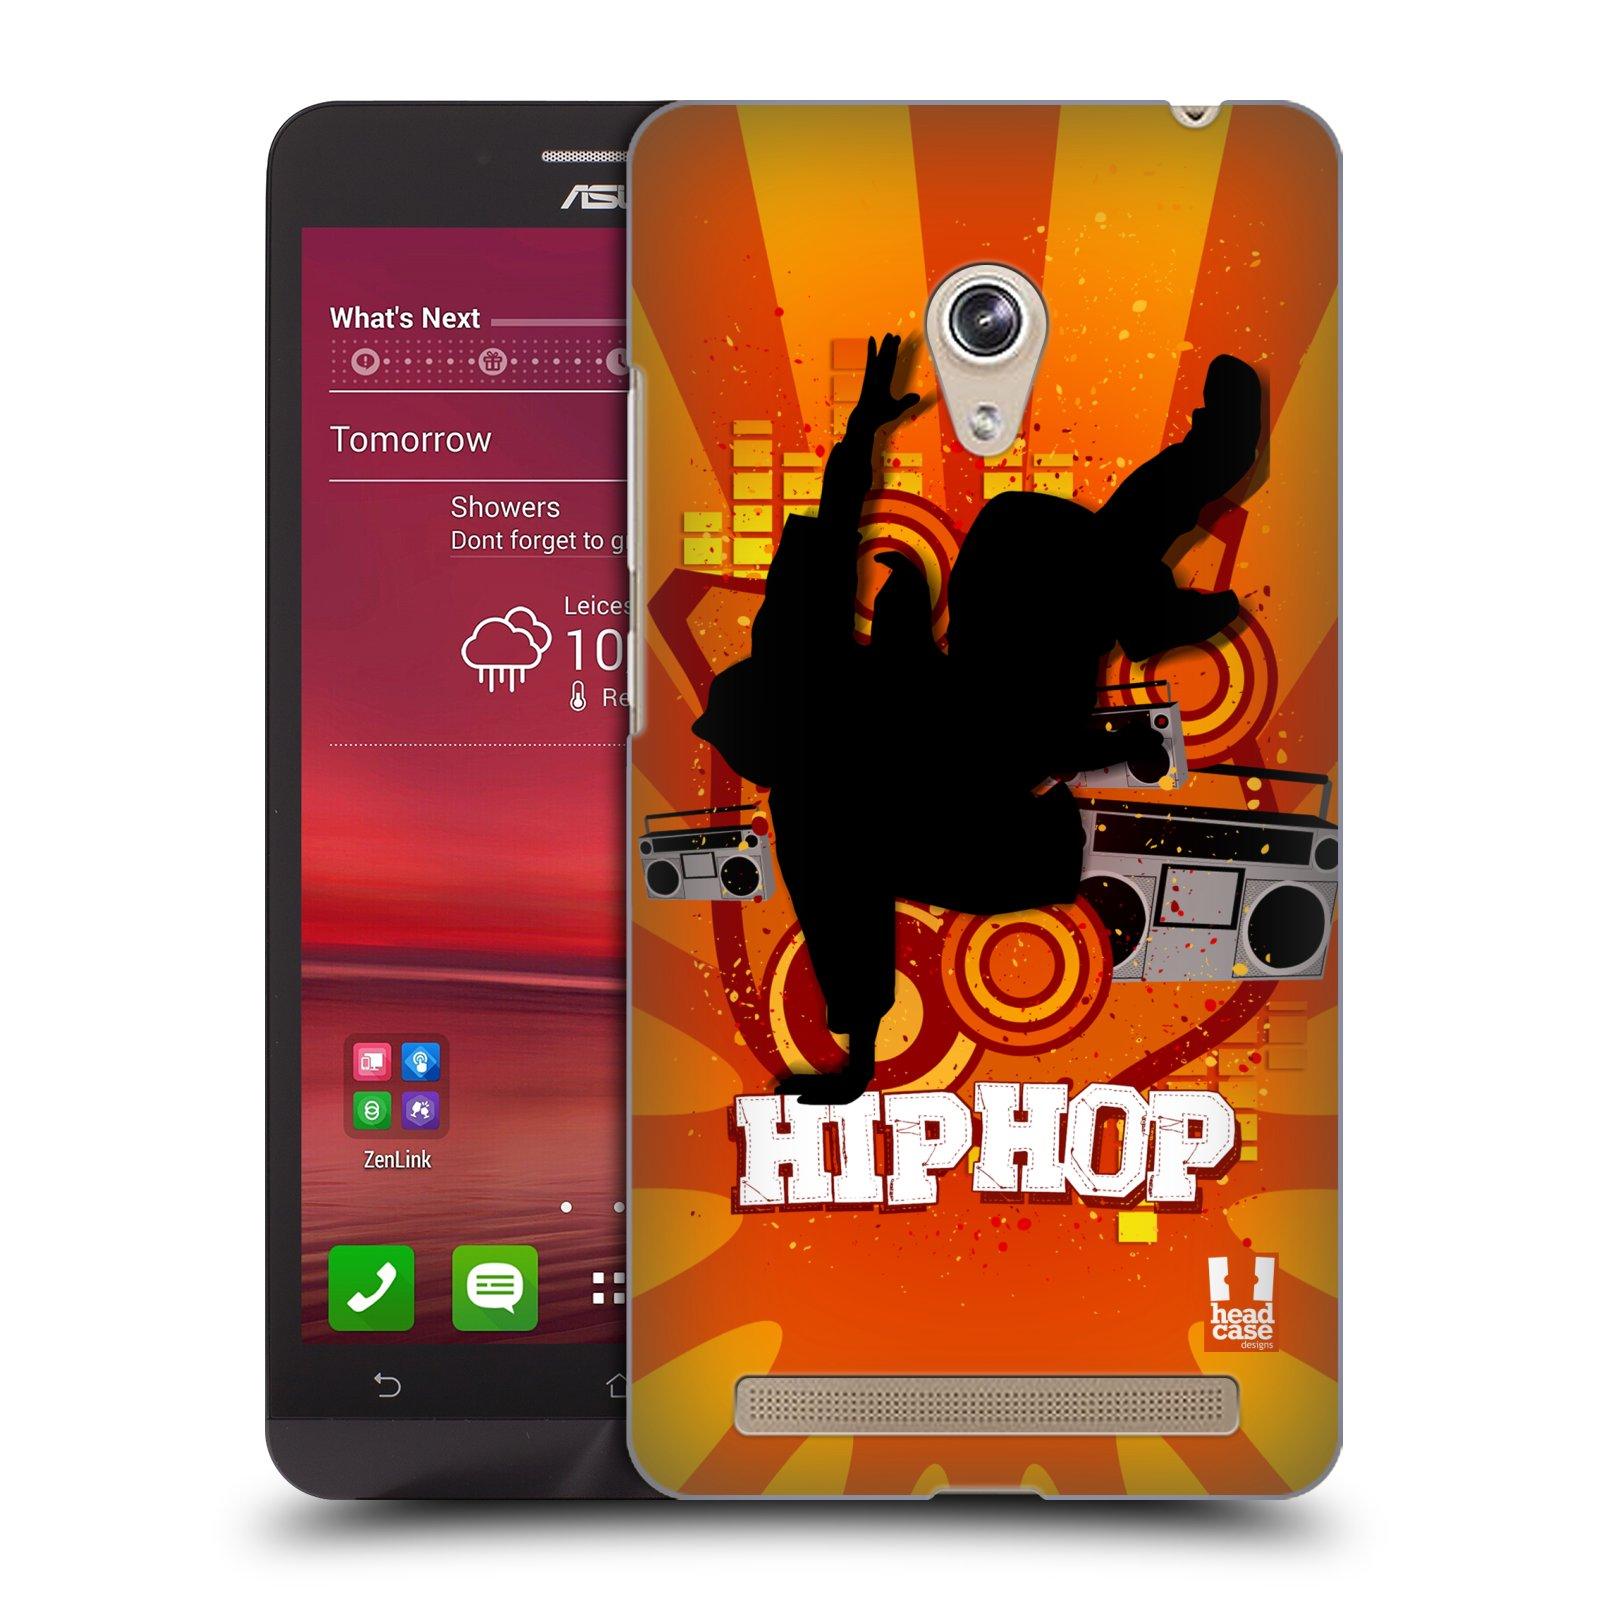 HEAD CASE plastový obal na mobil Asus Zenfone 6 vzor TANEC SILUETA HIP HOP